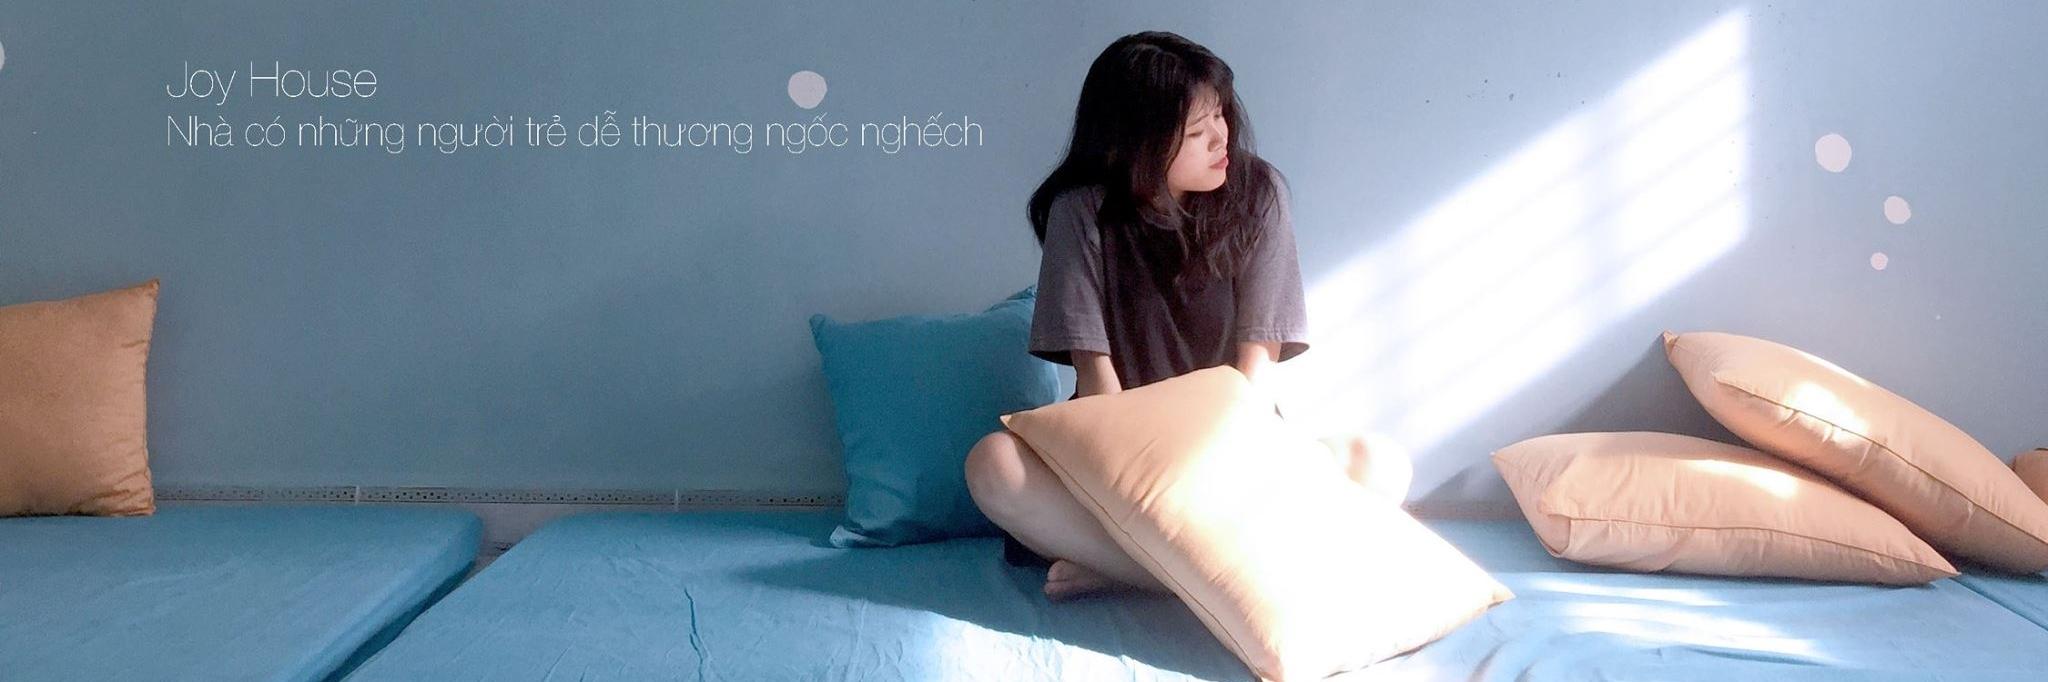 https://gody.vn/blog/tram_anhh_55/post/joy-house-nha-co-nhung-nguoi-tre-de-thuong-ngoc-nghech-125